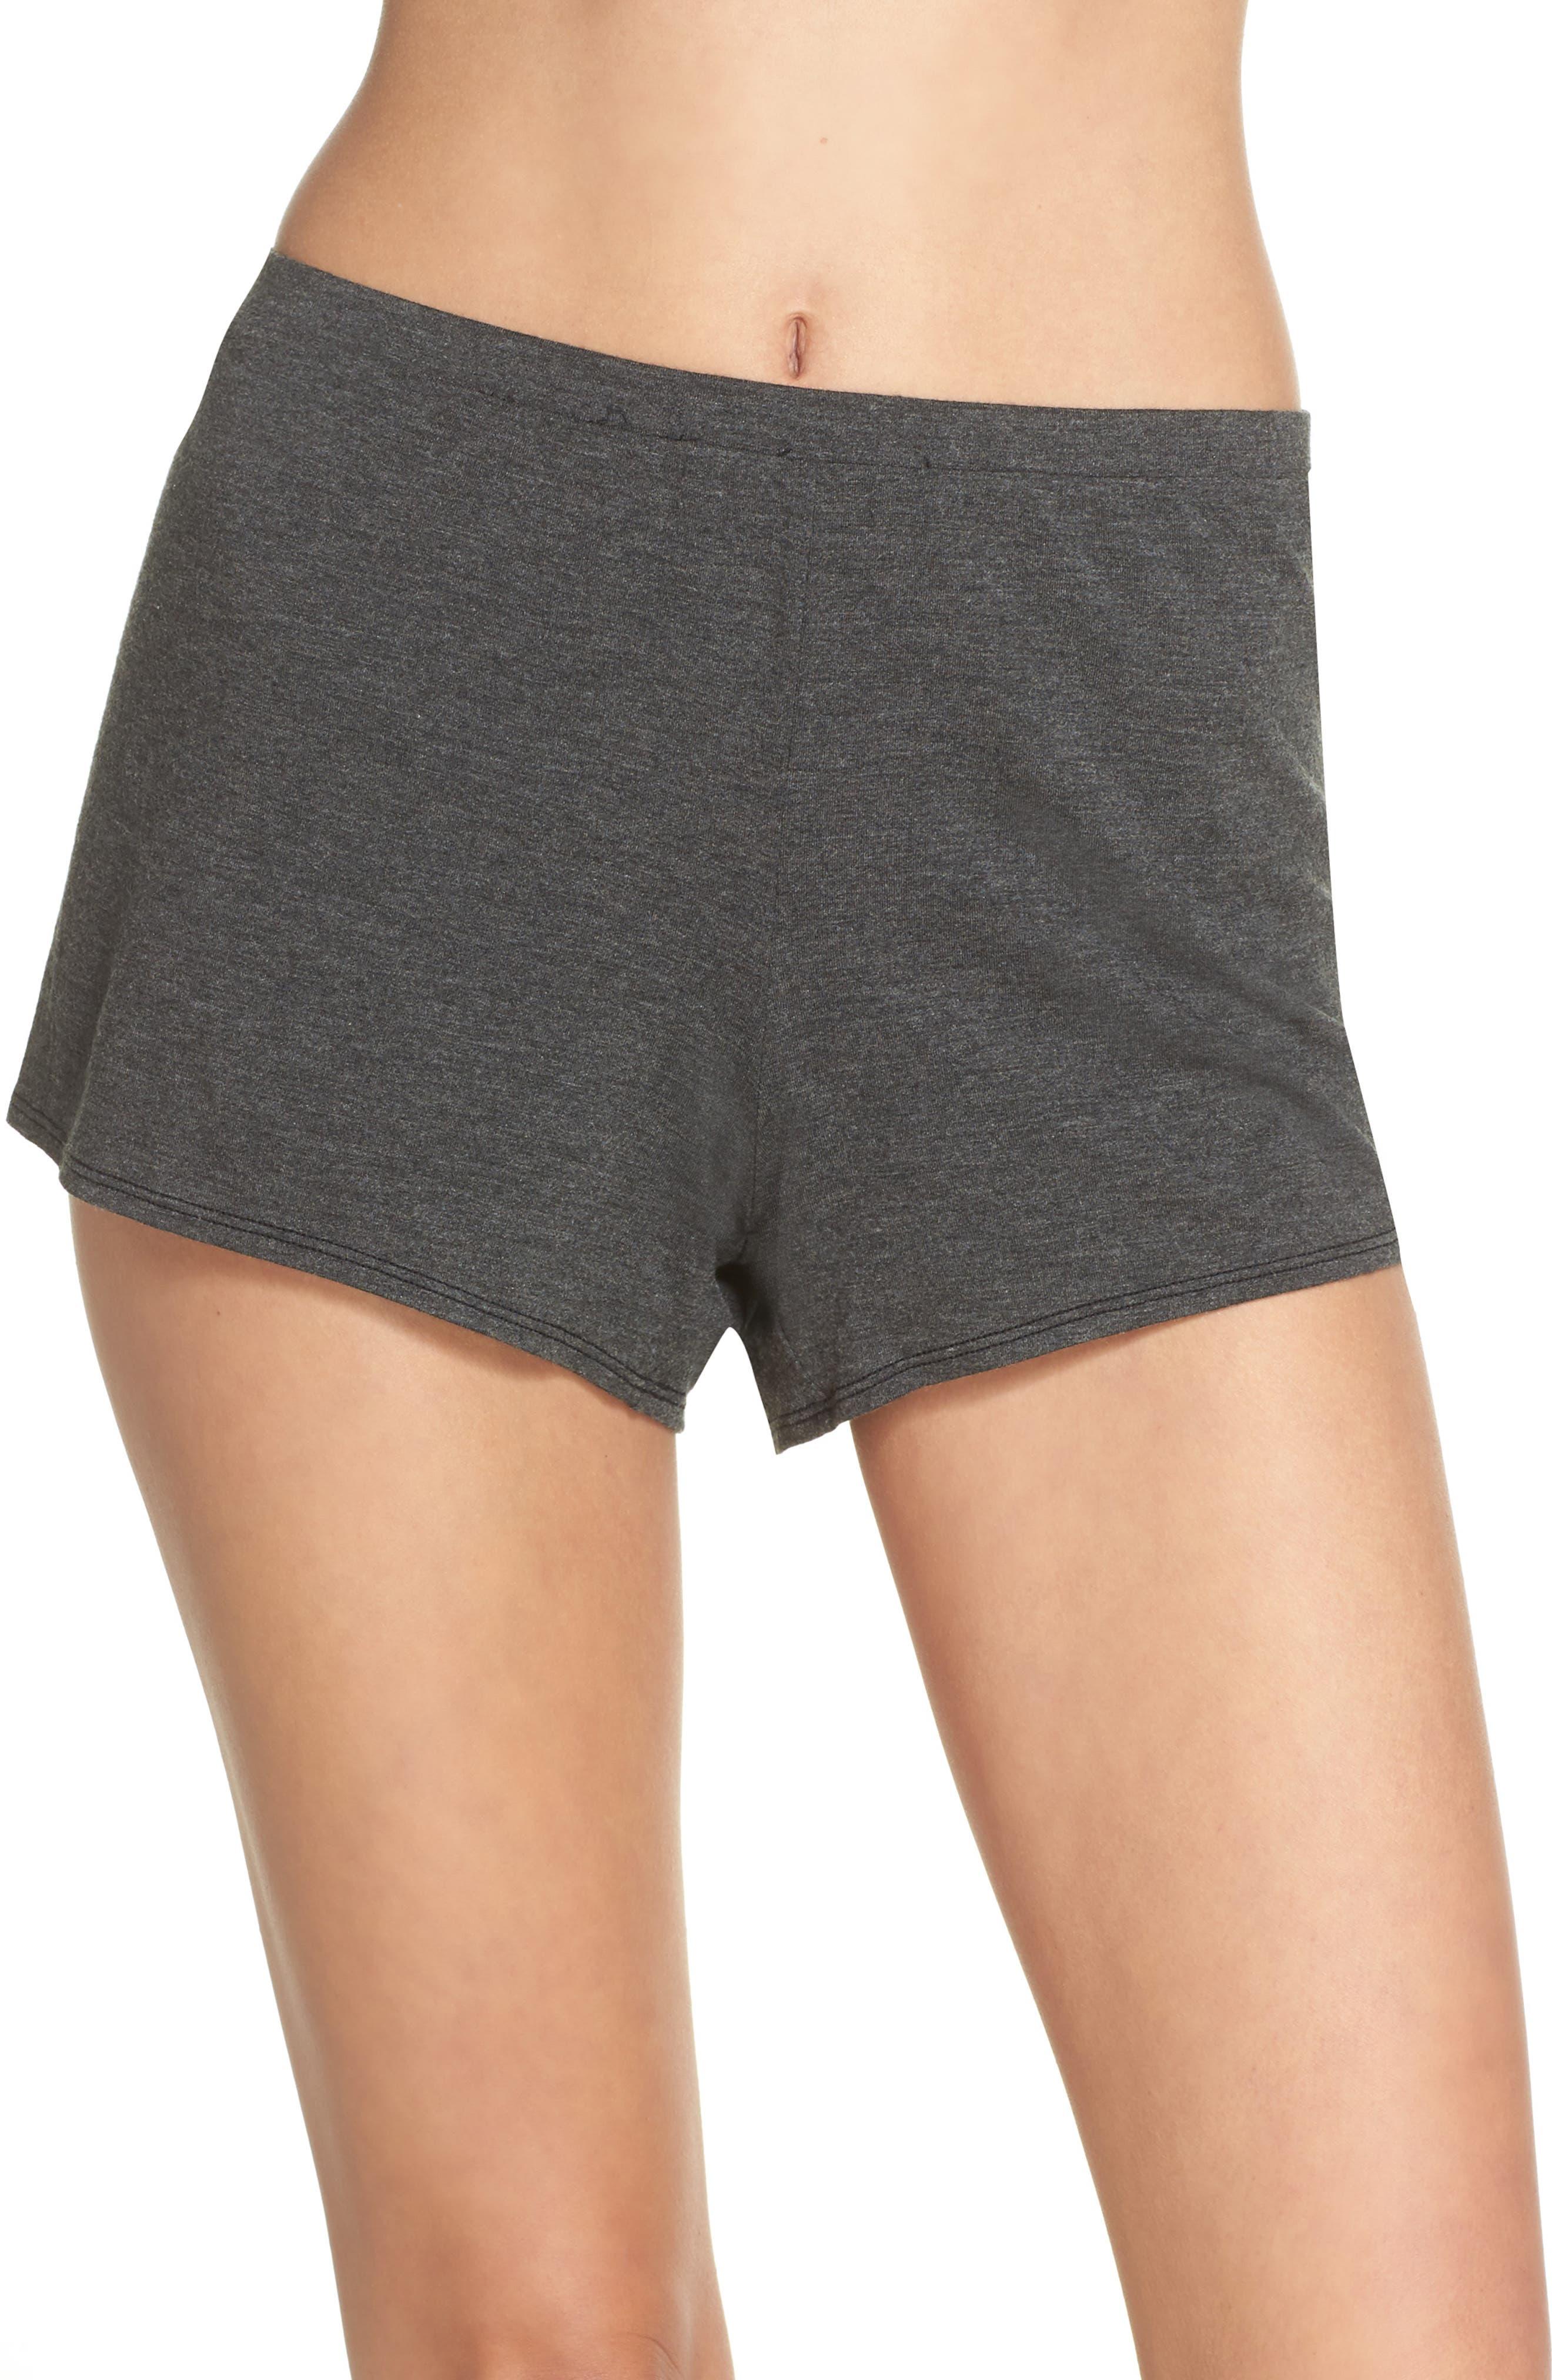 Undressed Pajama Shorts,                             Main thumbnail 1, color,                             001